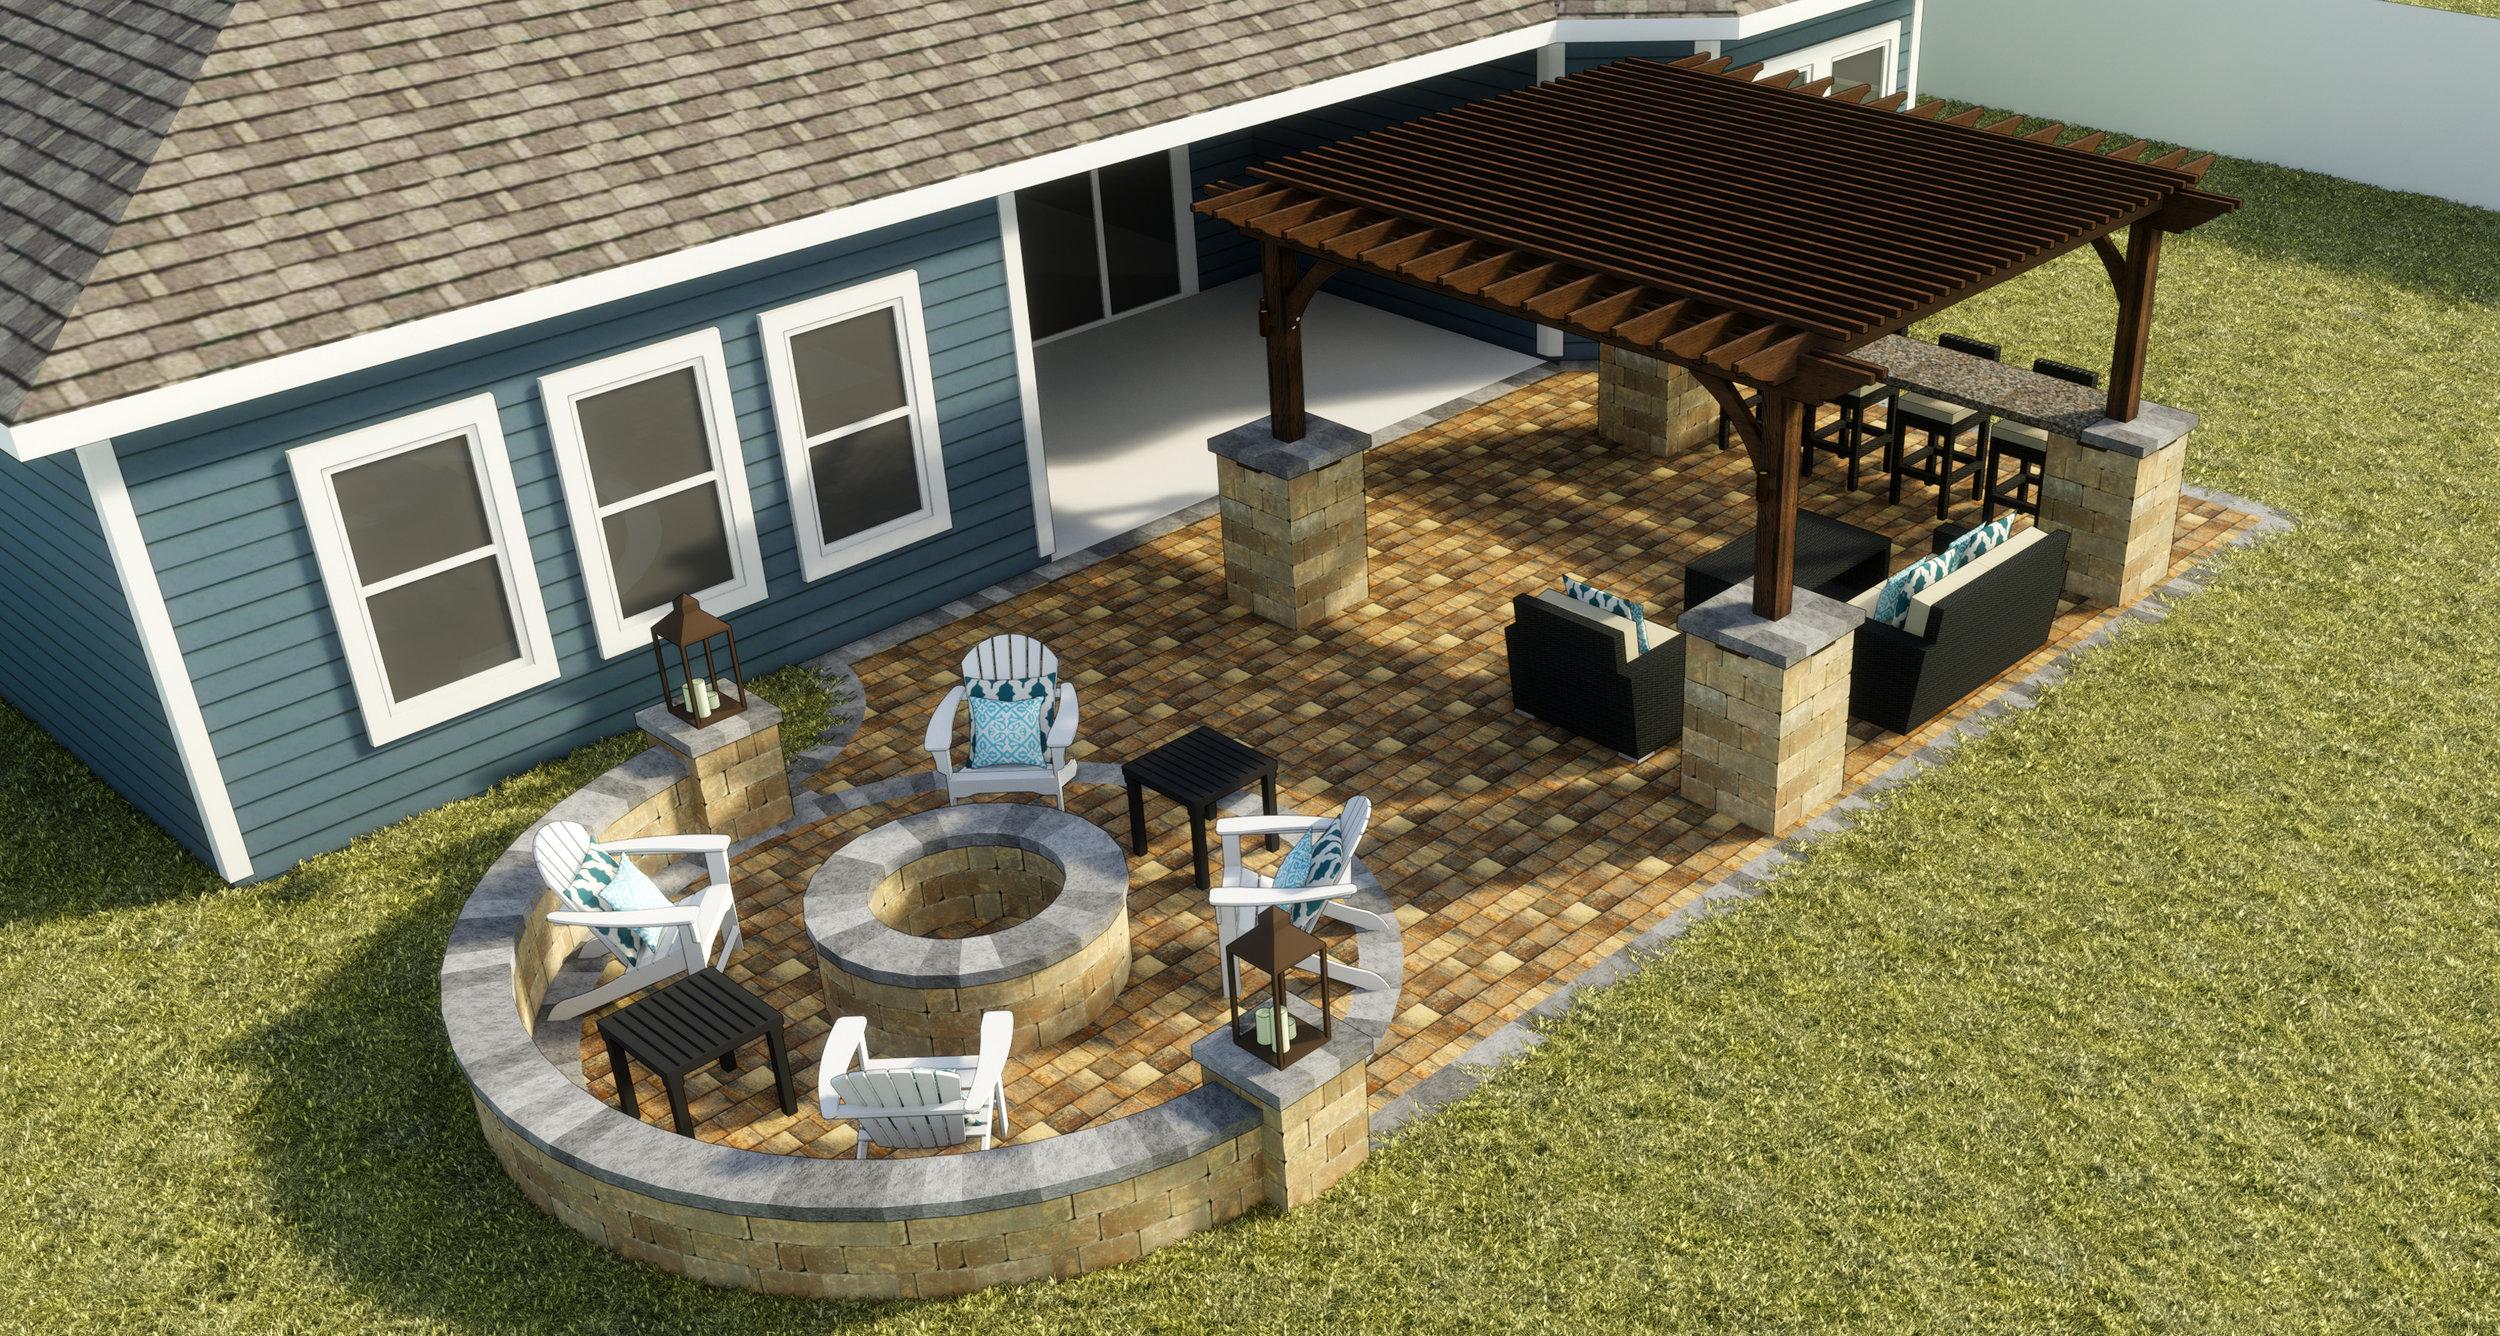 Cedar Key - Paver Patio | Fire Pit + Seating Wall | Signature Pergola | Stonegate Columns | Floating Bar Top